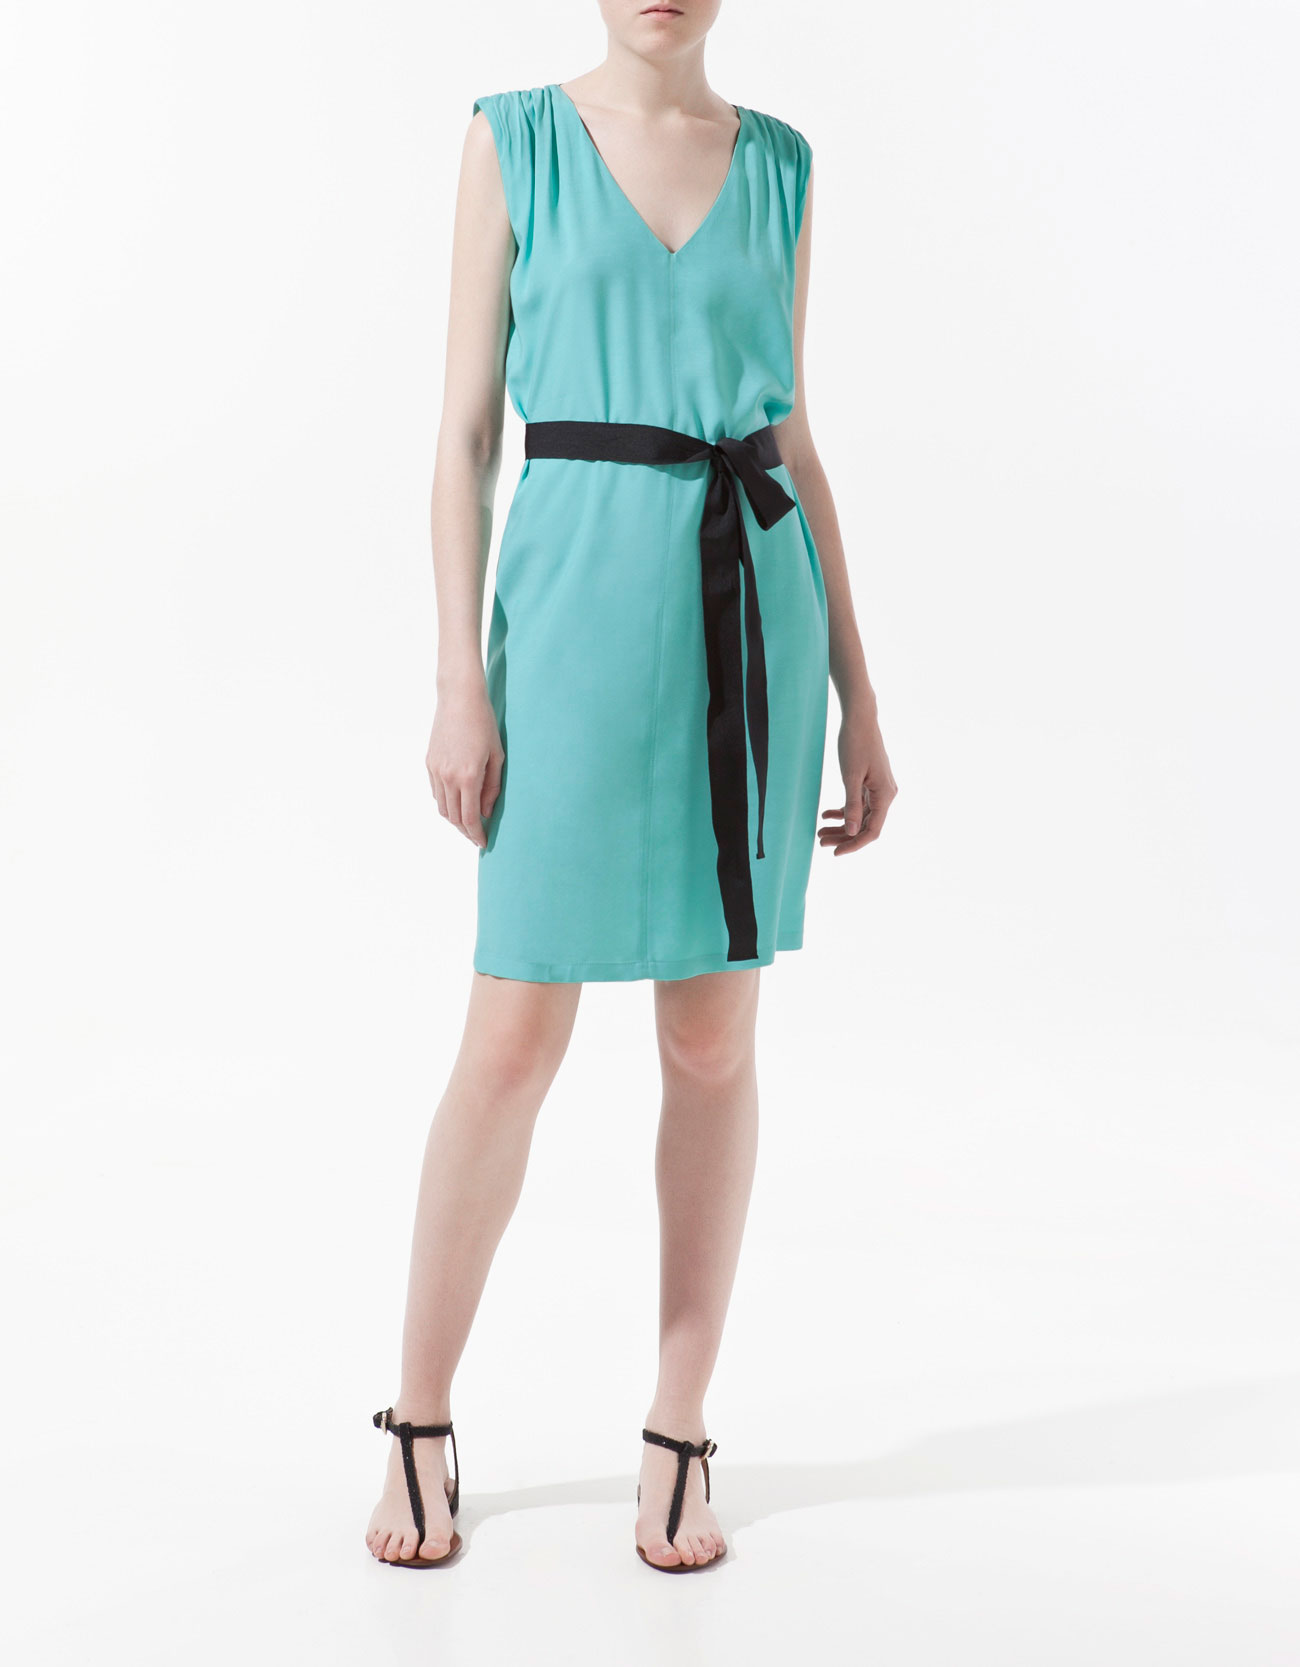 zara dress with grosgrain ribbon belt in blue aquamarine